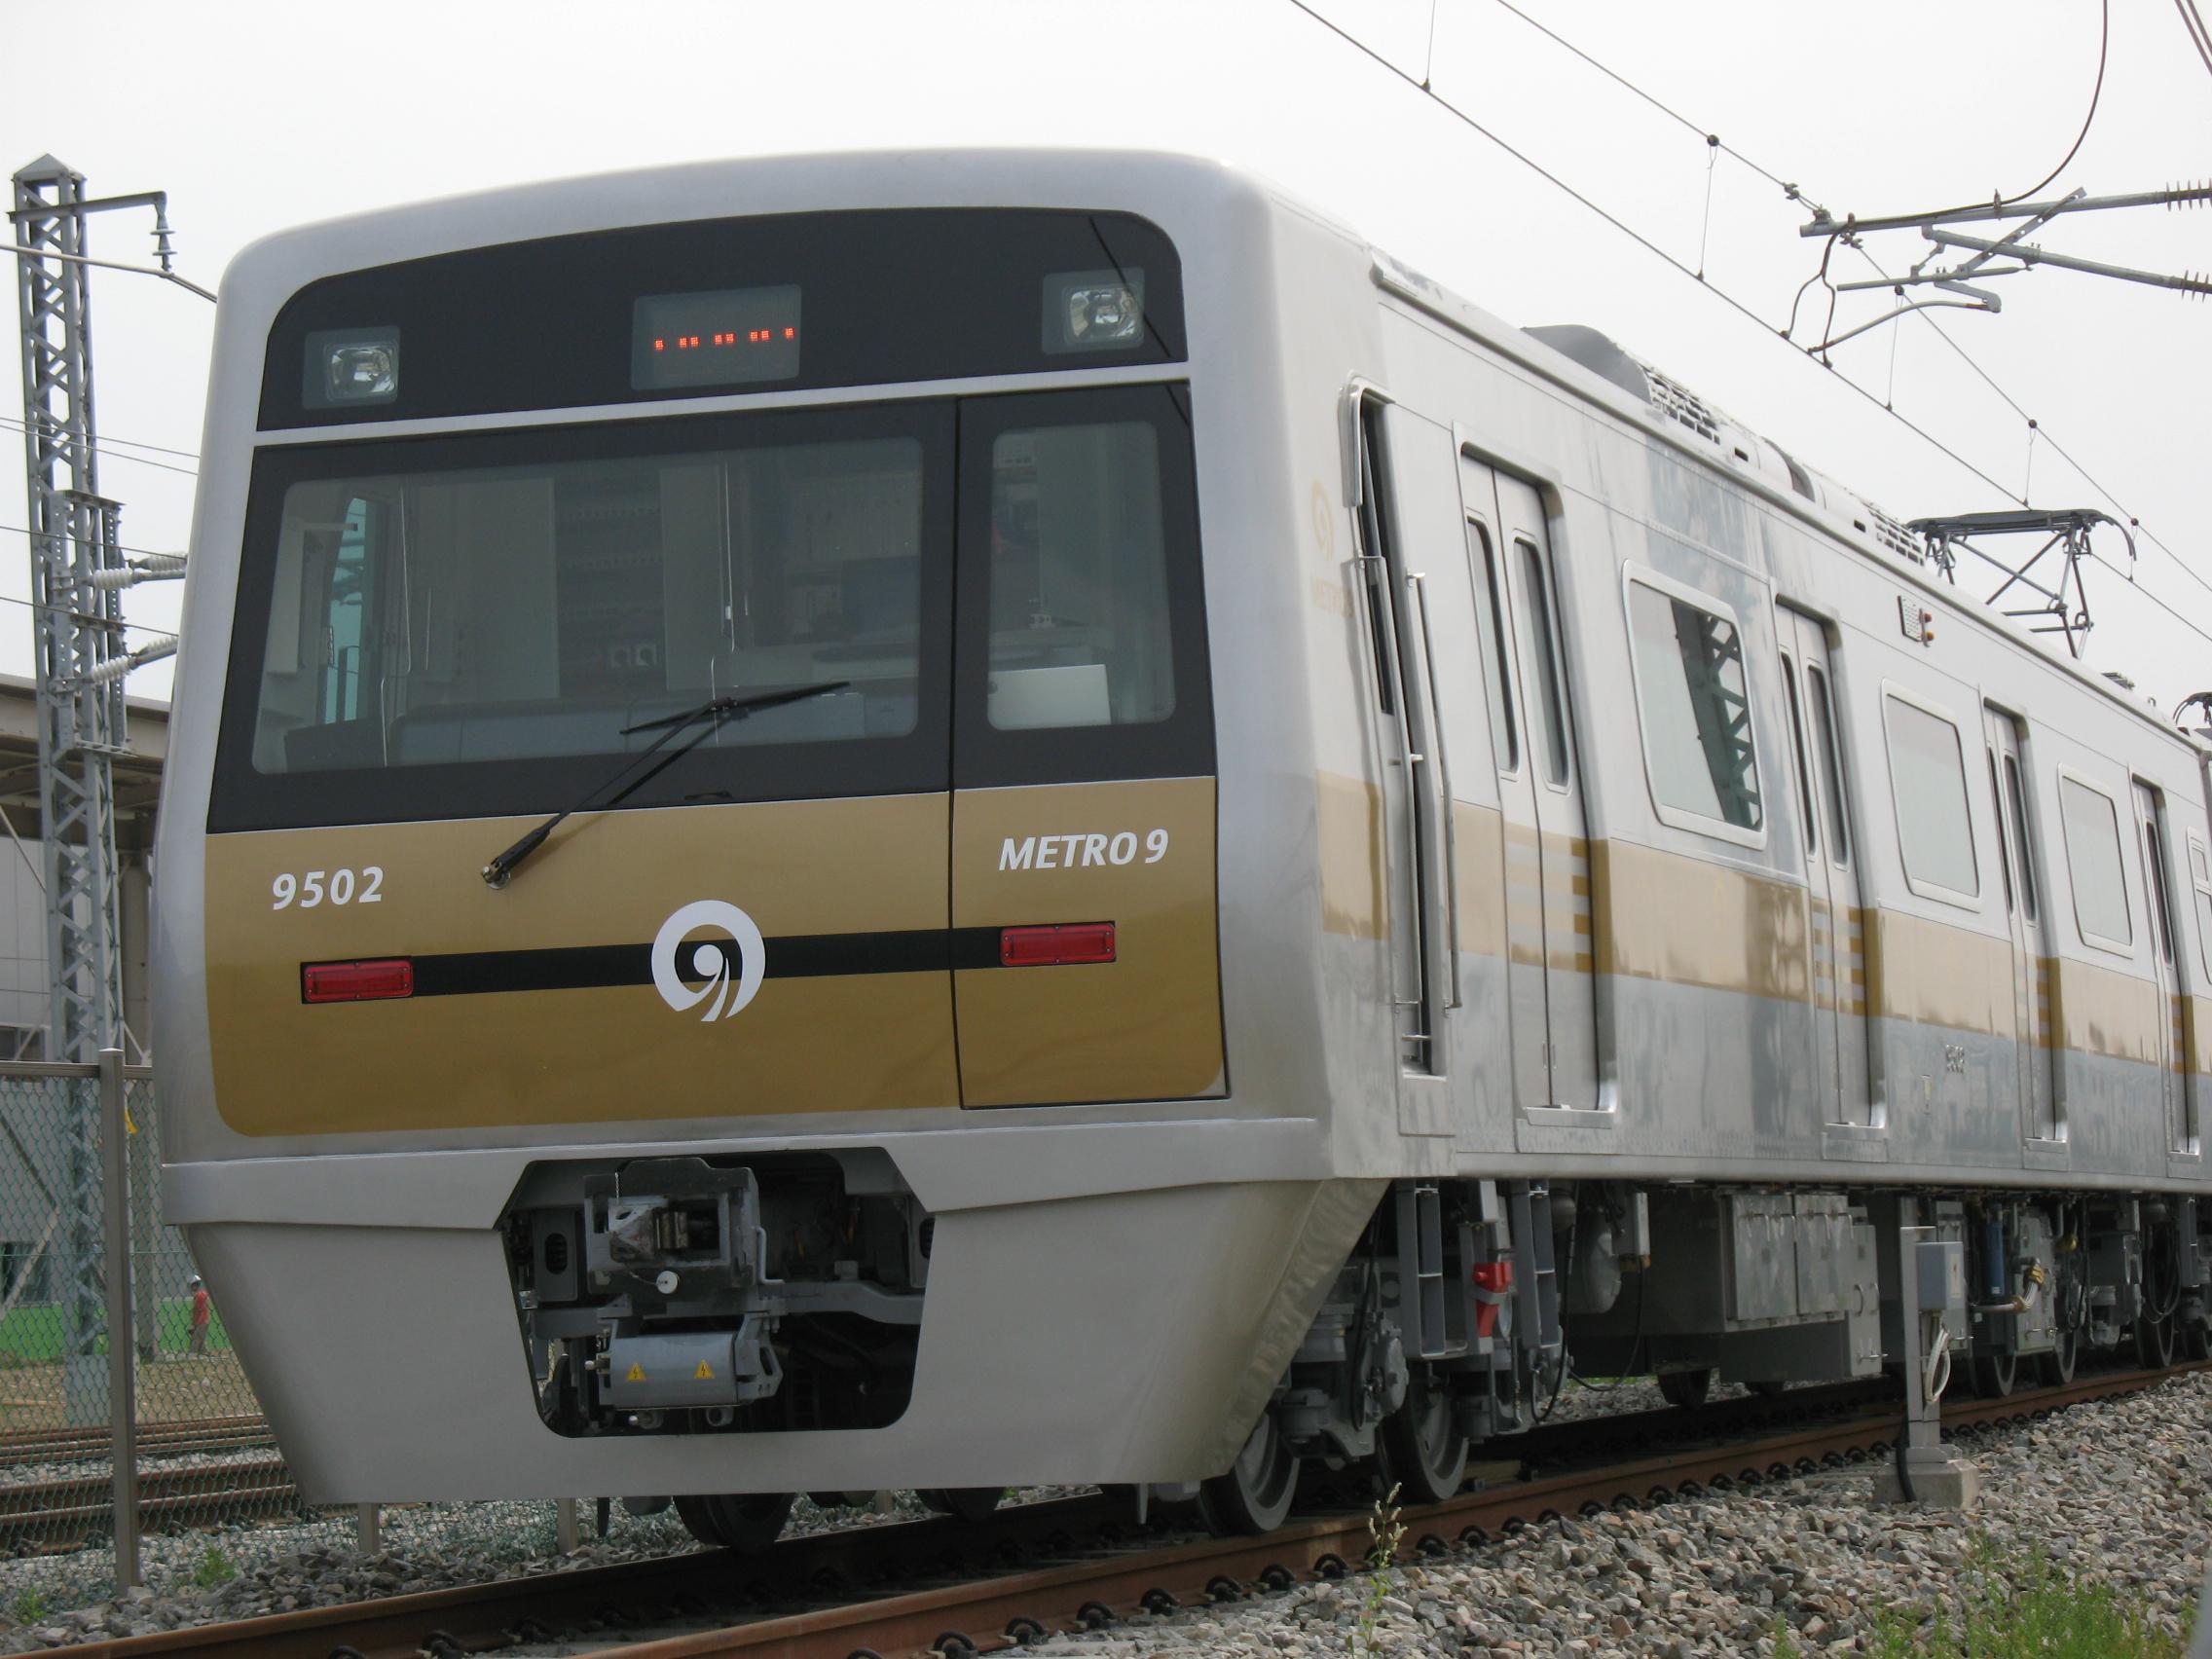 El juego de las imagenes-https://upload.wikimedia.org/wikipedia/commons/a/a6/SeoulMetro9_Train_9502.JPG